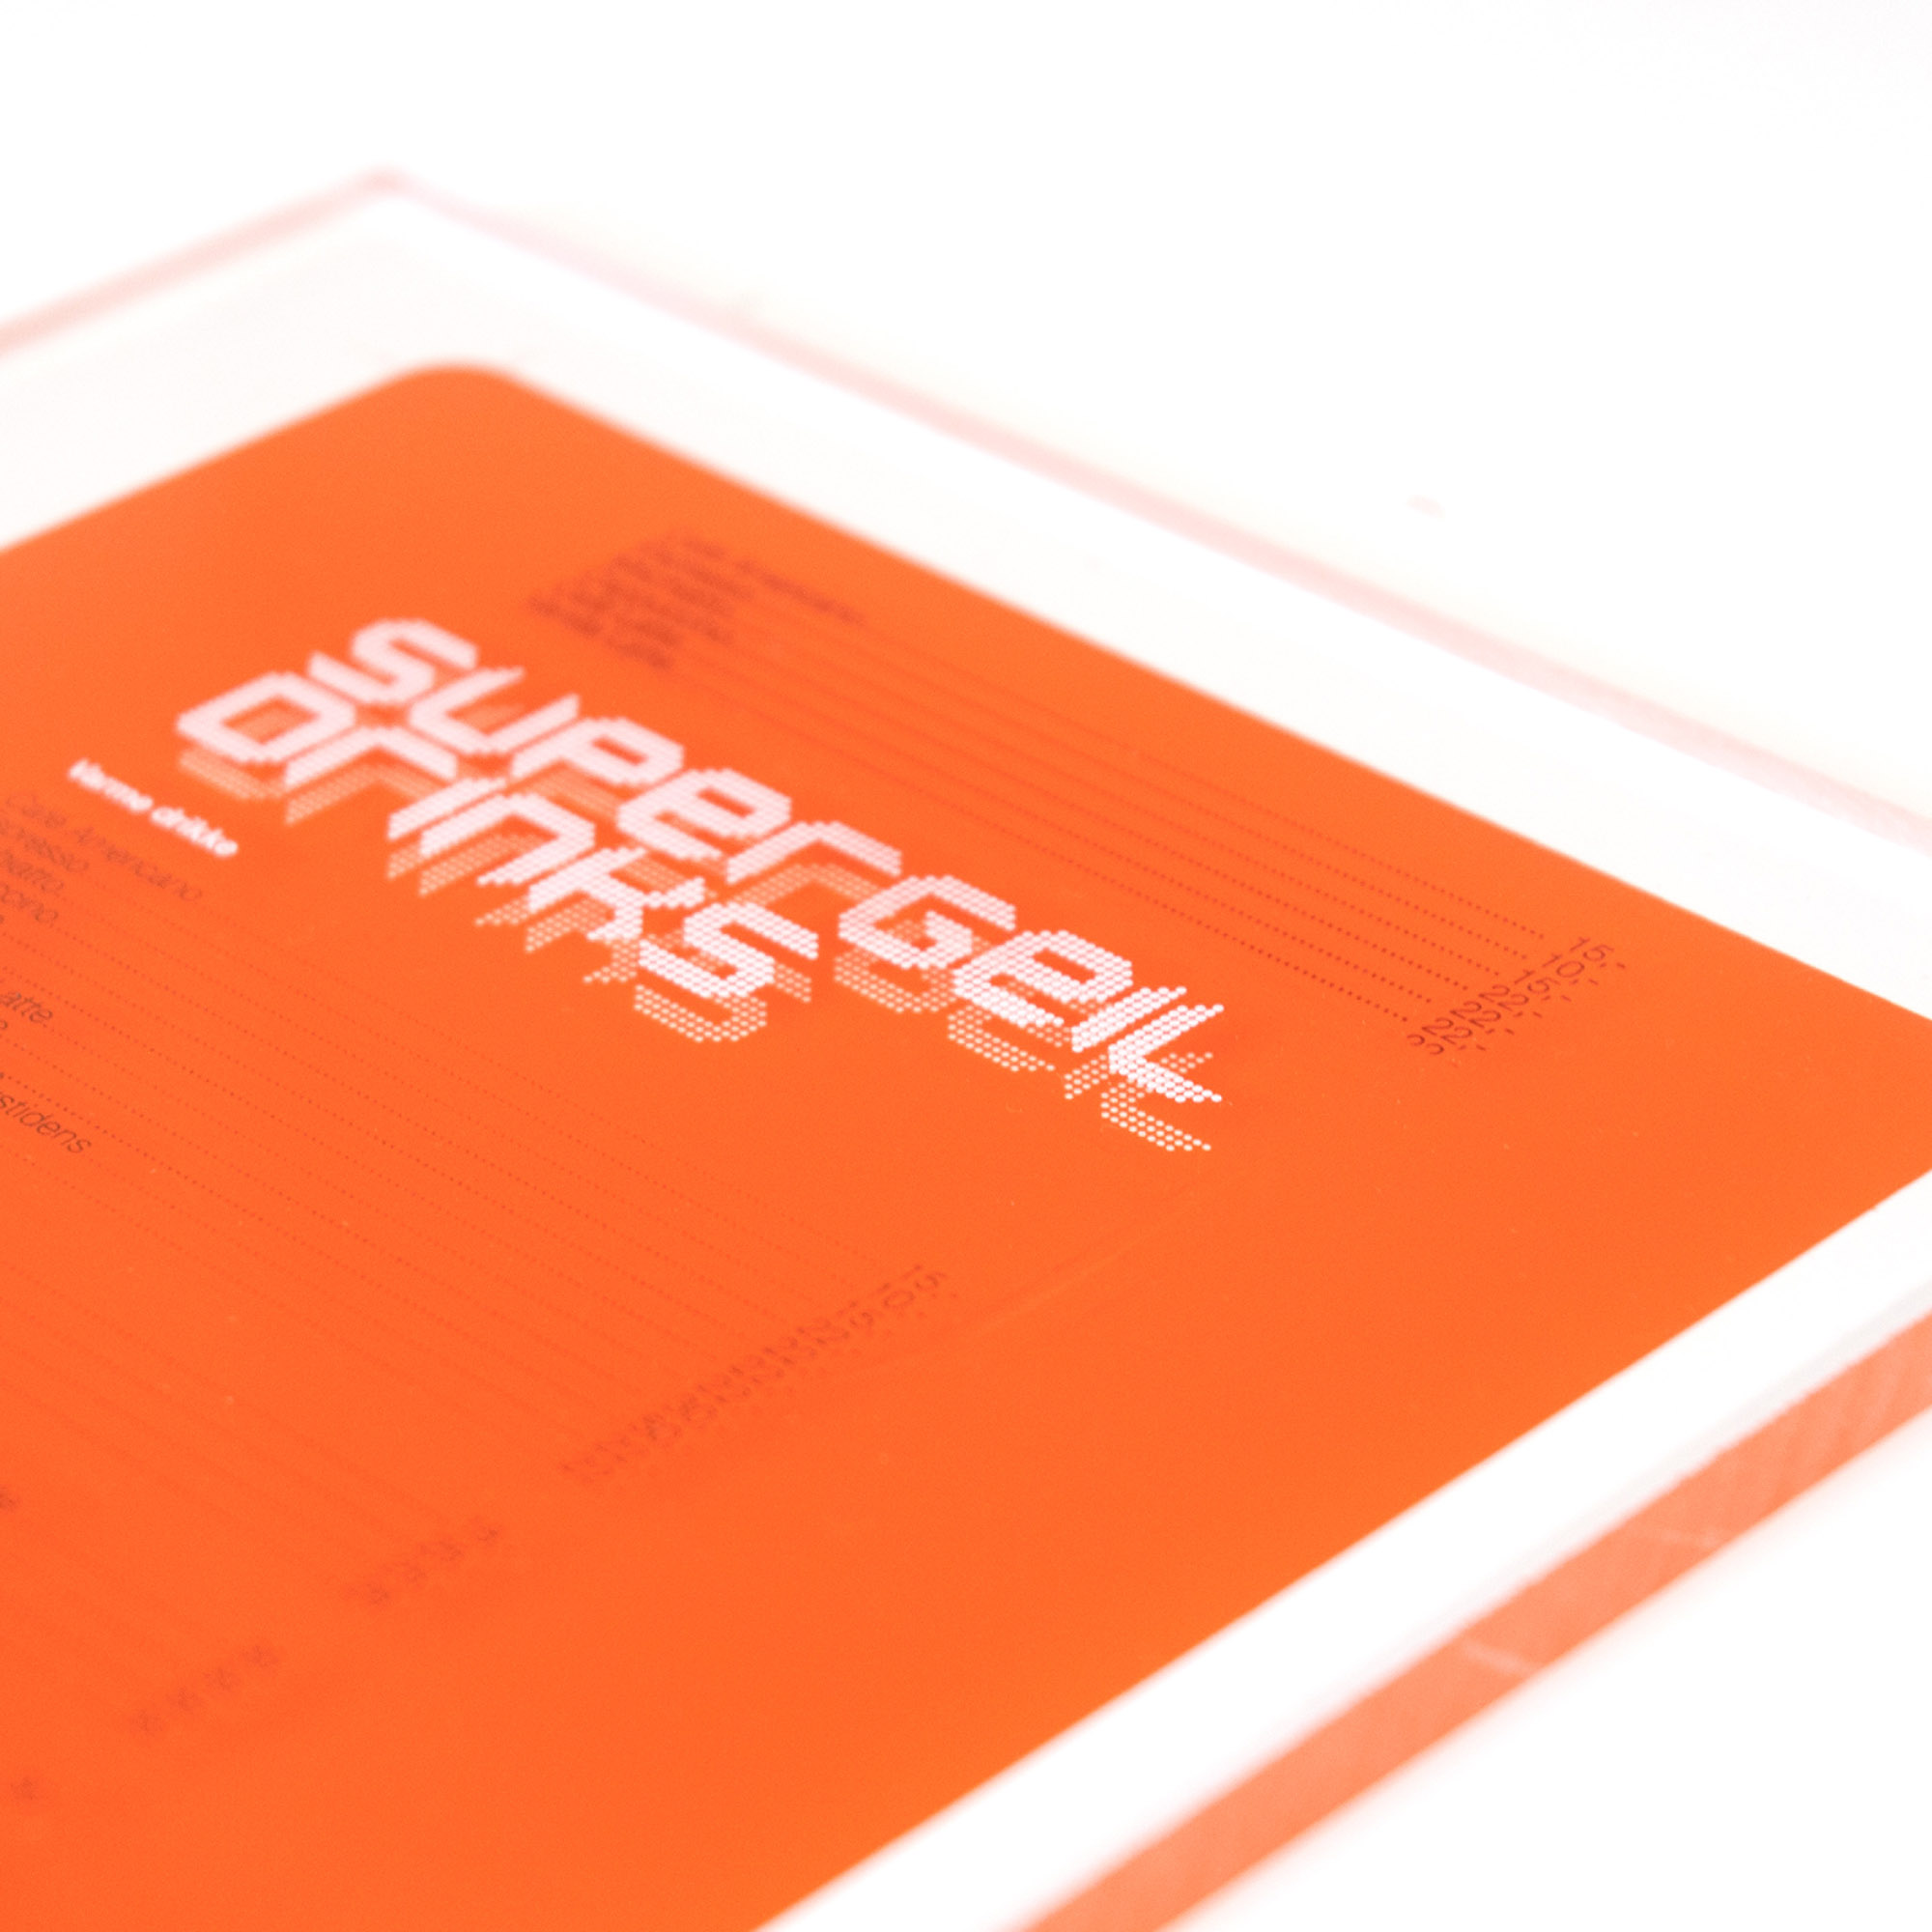 Orange menu card for Supergeil restaurant